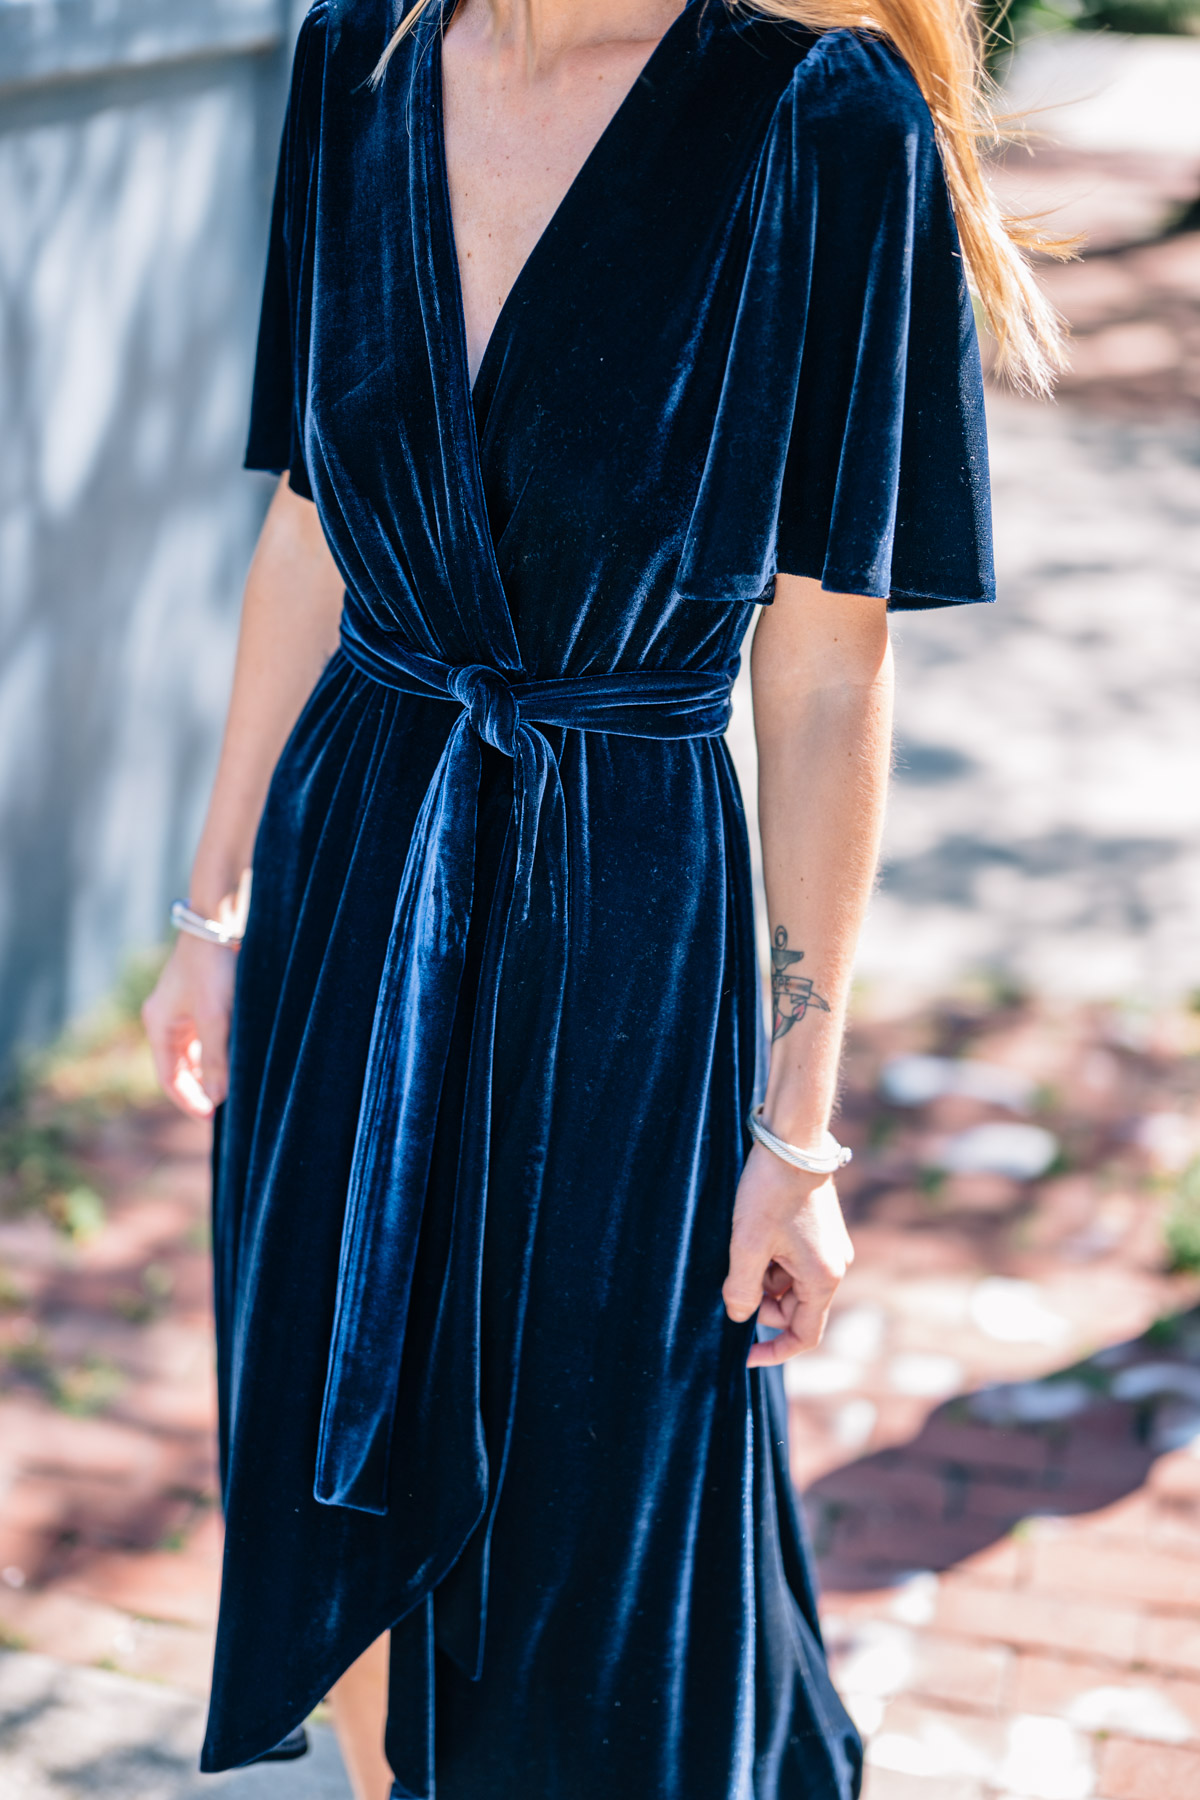 Jess Ann Kirby styles a velvet wrap midi dress by Donna Morgan for a fall wedding